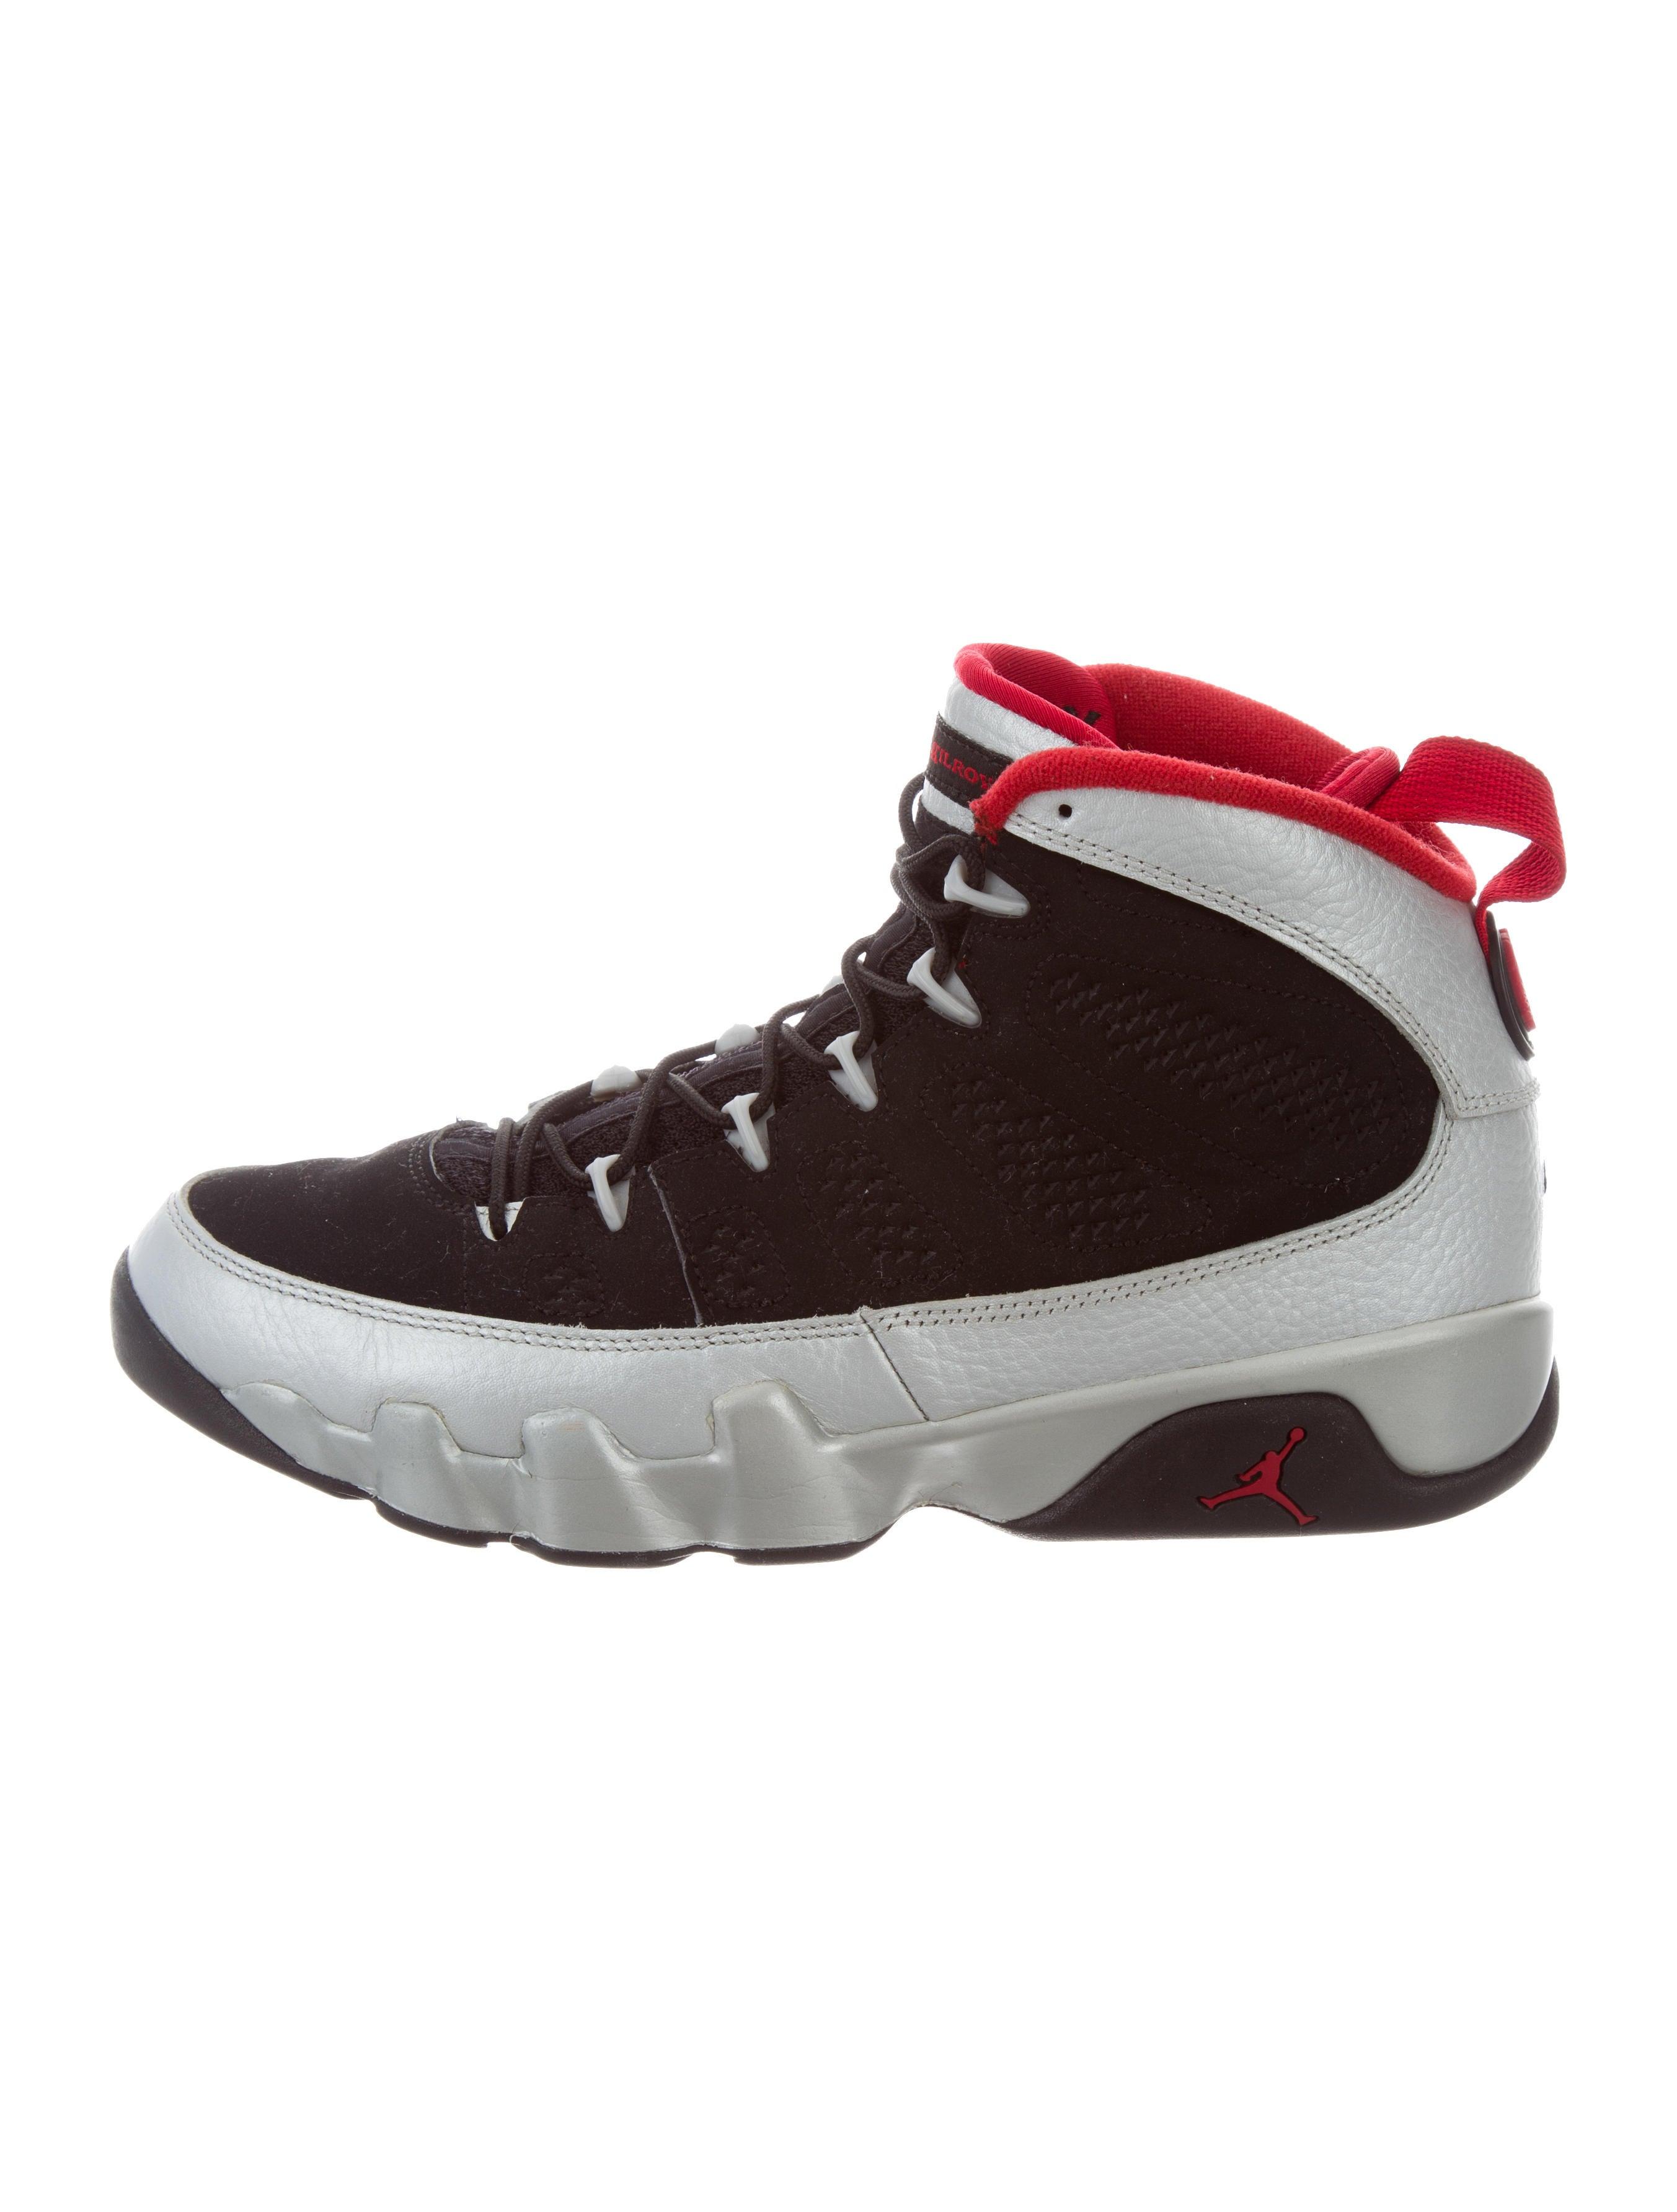 Nike Air Jordan 9 Retro Johnny Kilroy Sneakers Mens Shoes Wniaj20250 The Realreal